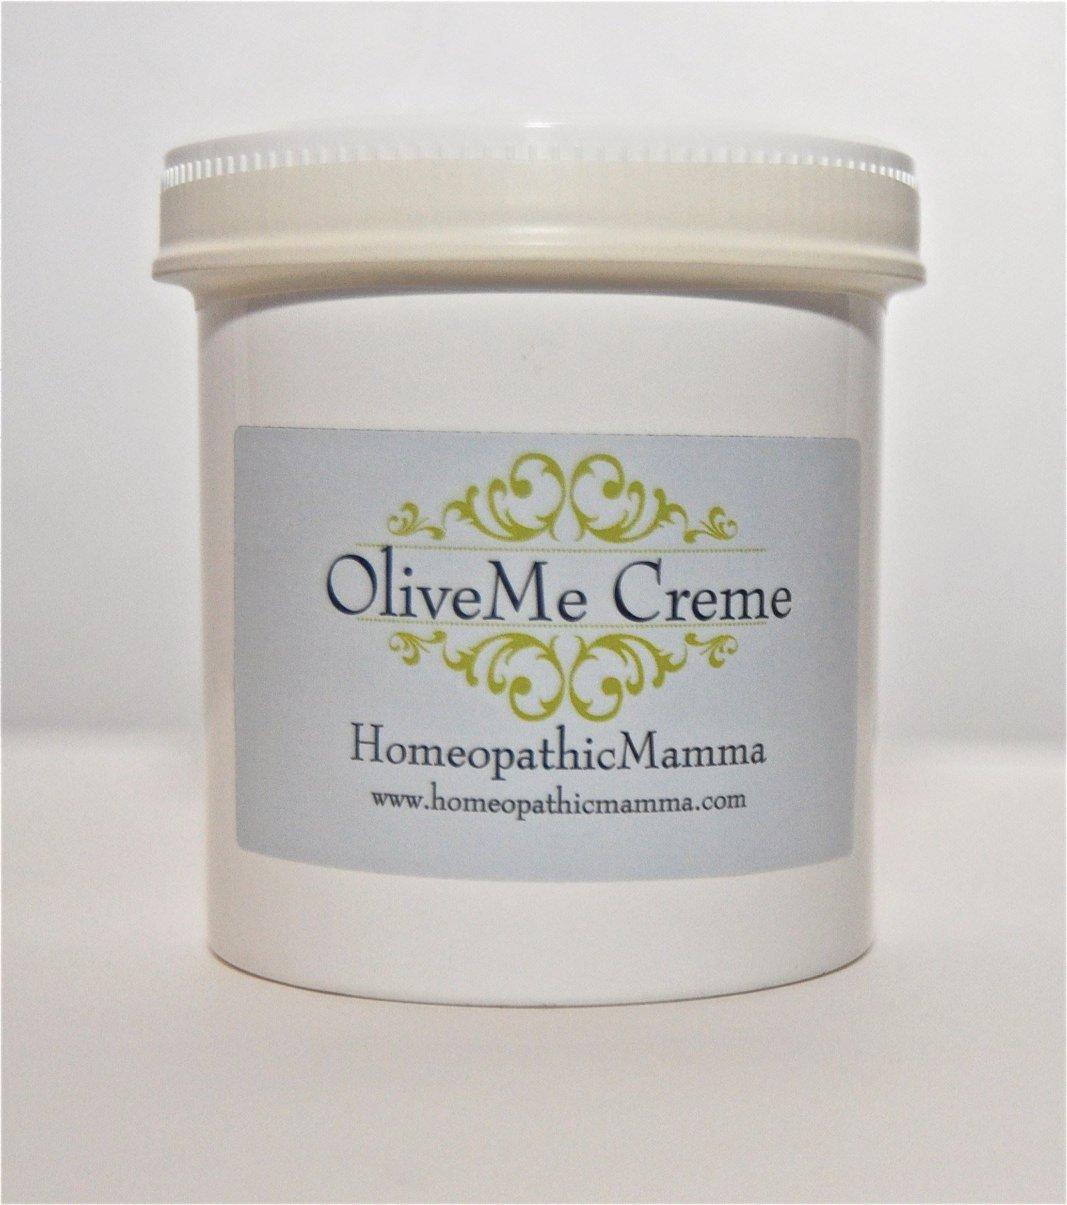 DSC 0101 - Homeopathic Mama